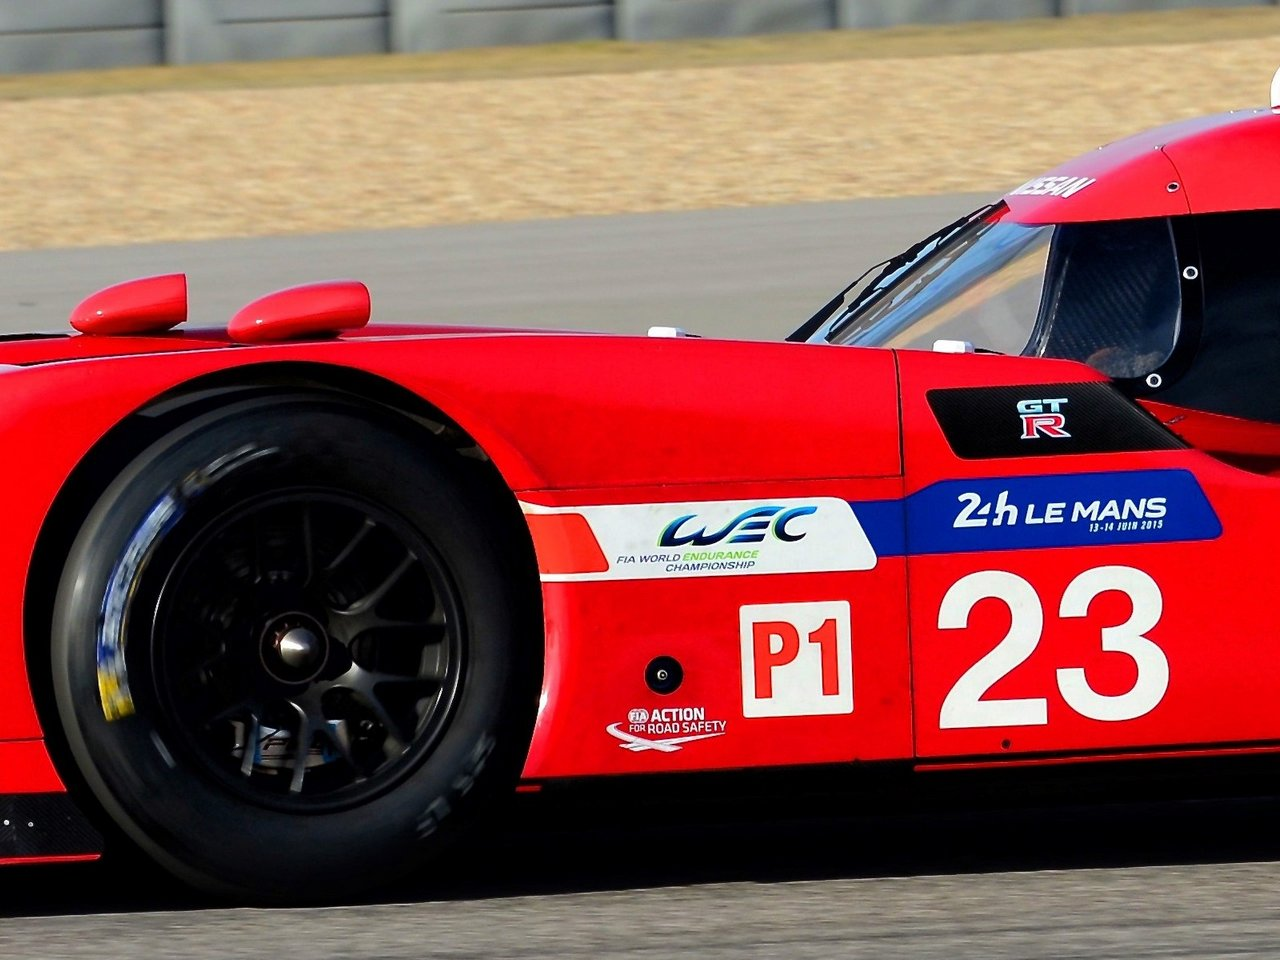 nissan-gt-r_lm-nismo-le-mans-2015-world-endurance-racing-hybrid-0-100_9